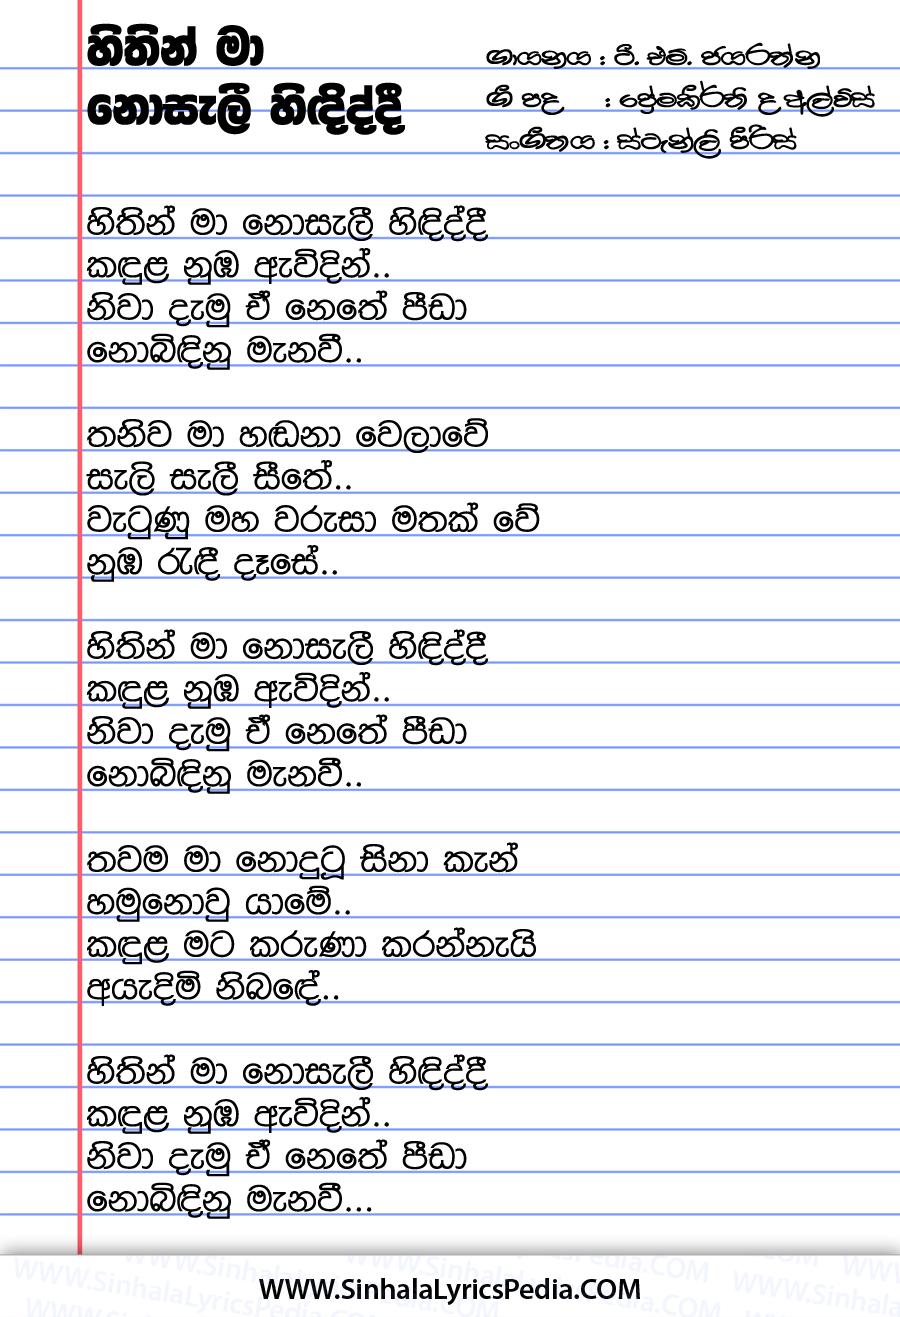 Sithin Ma Nosali Song Lyrics